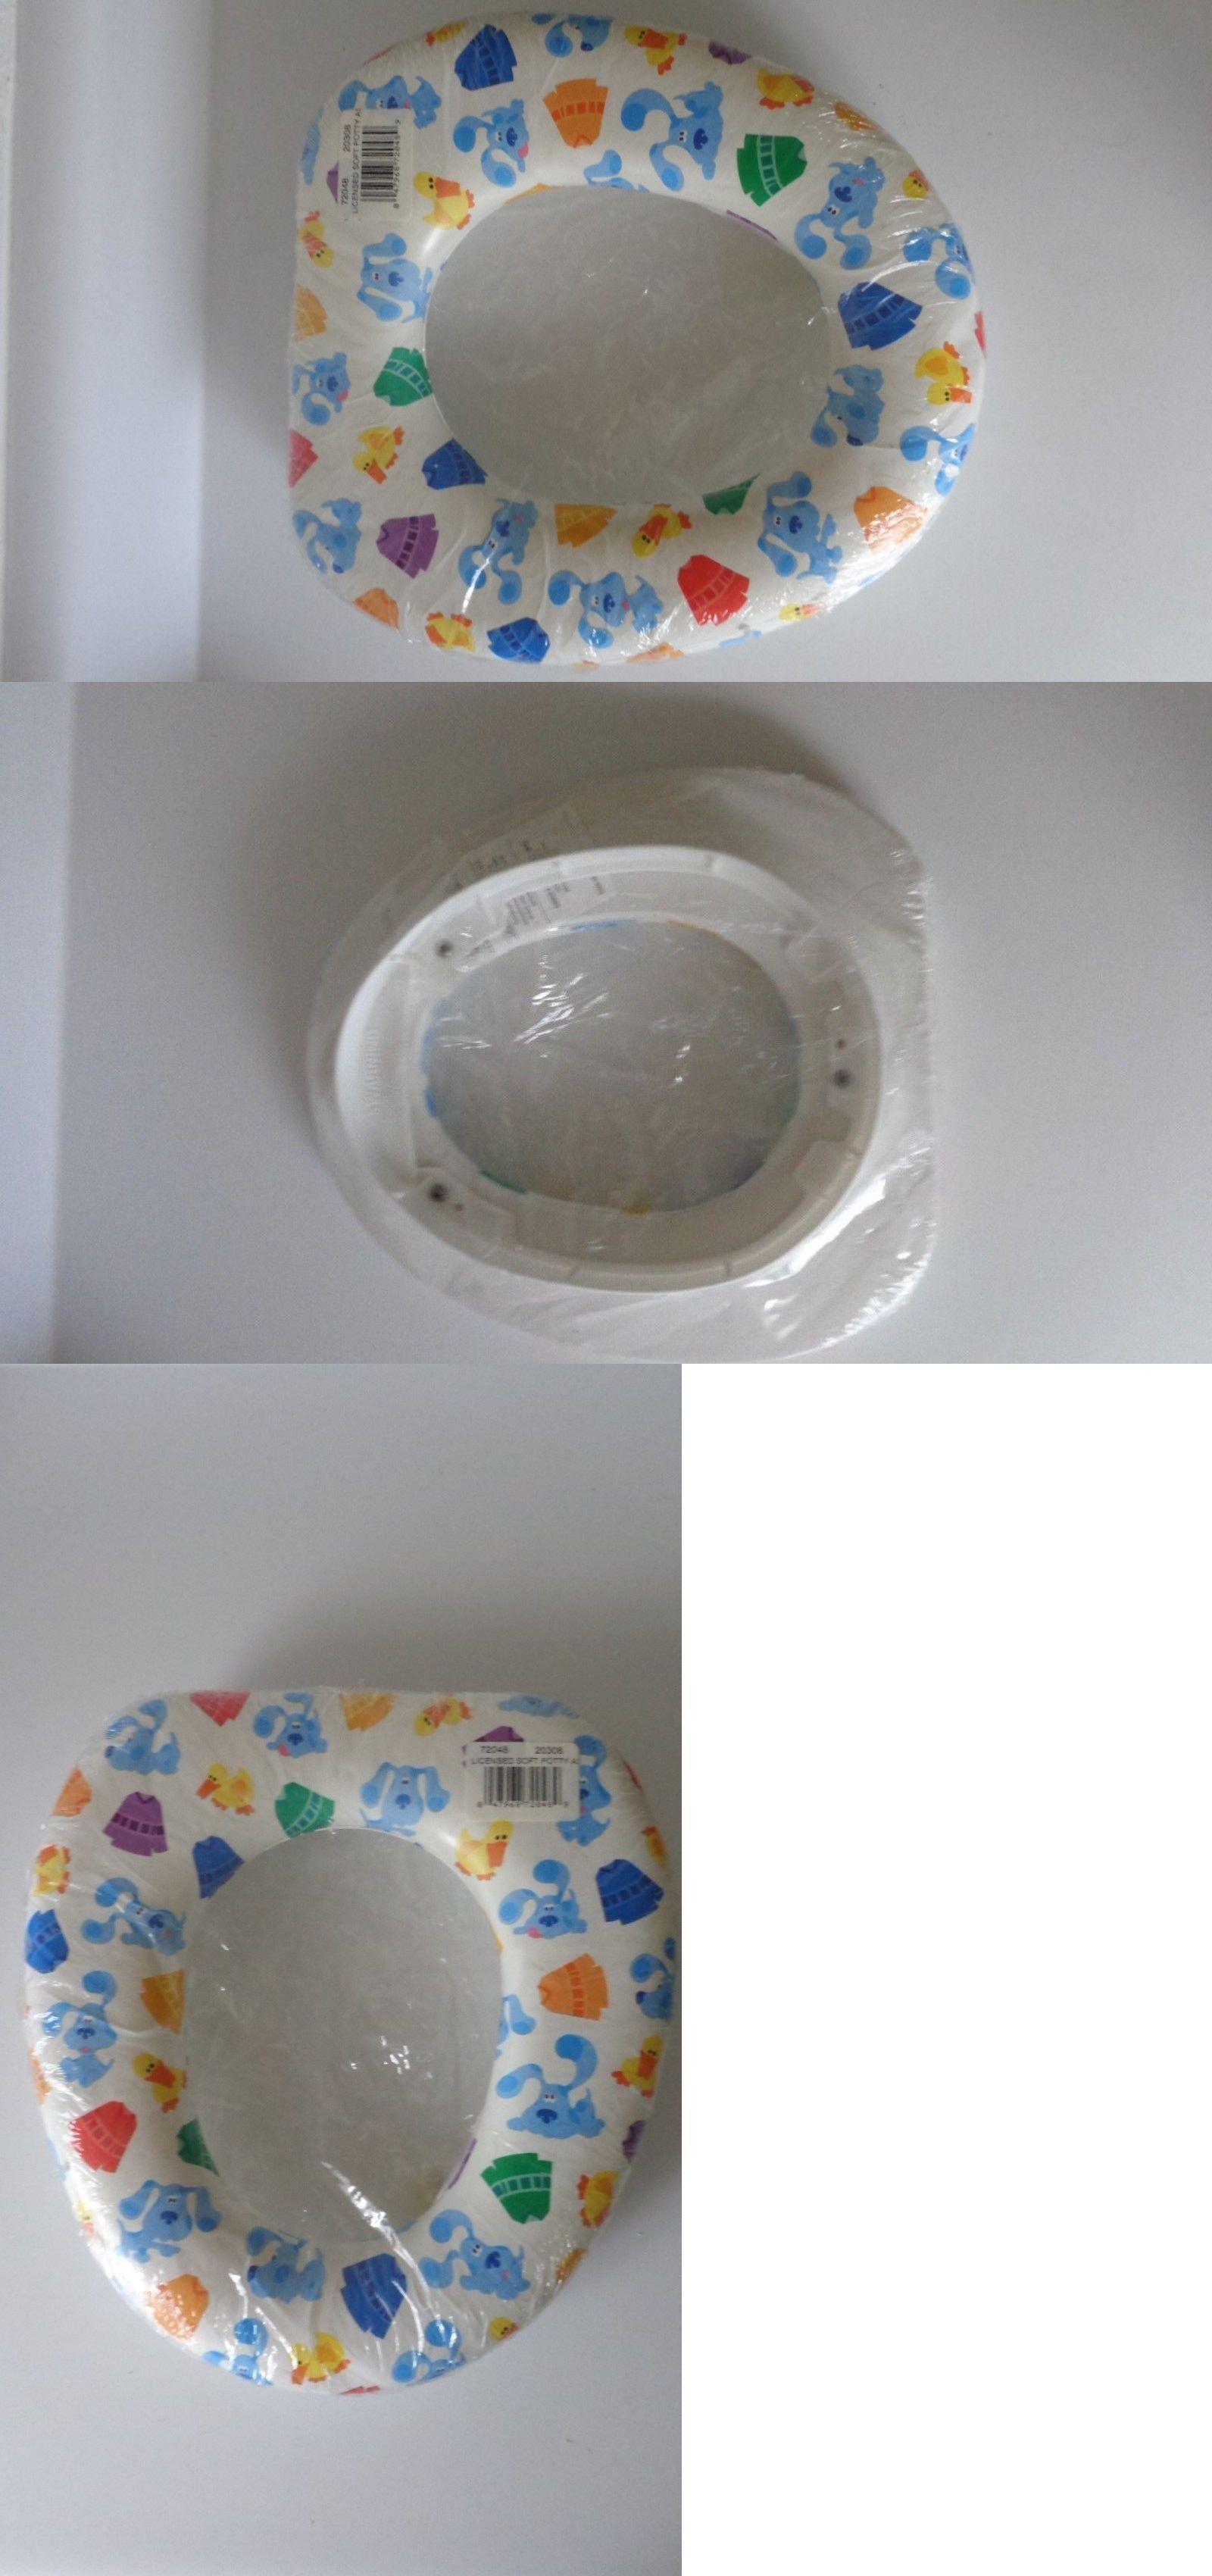 blues clues 2626 nick jr blues clues potty training toilet seat